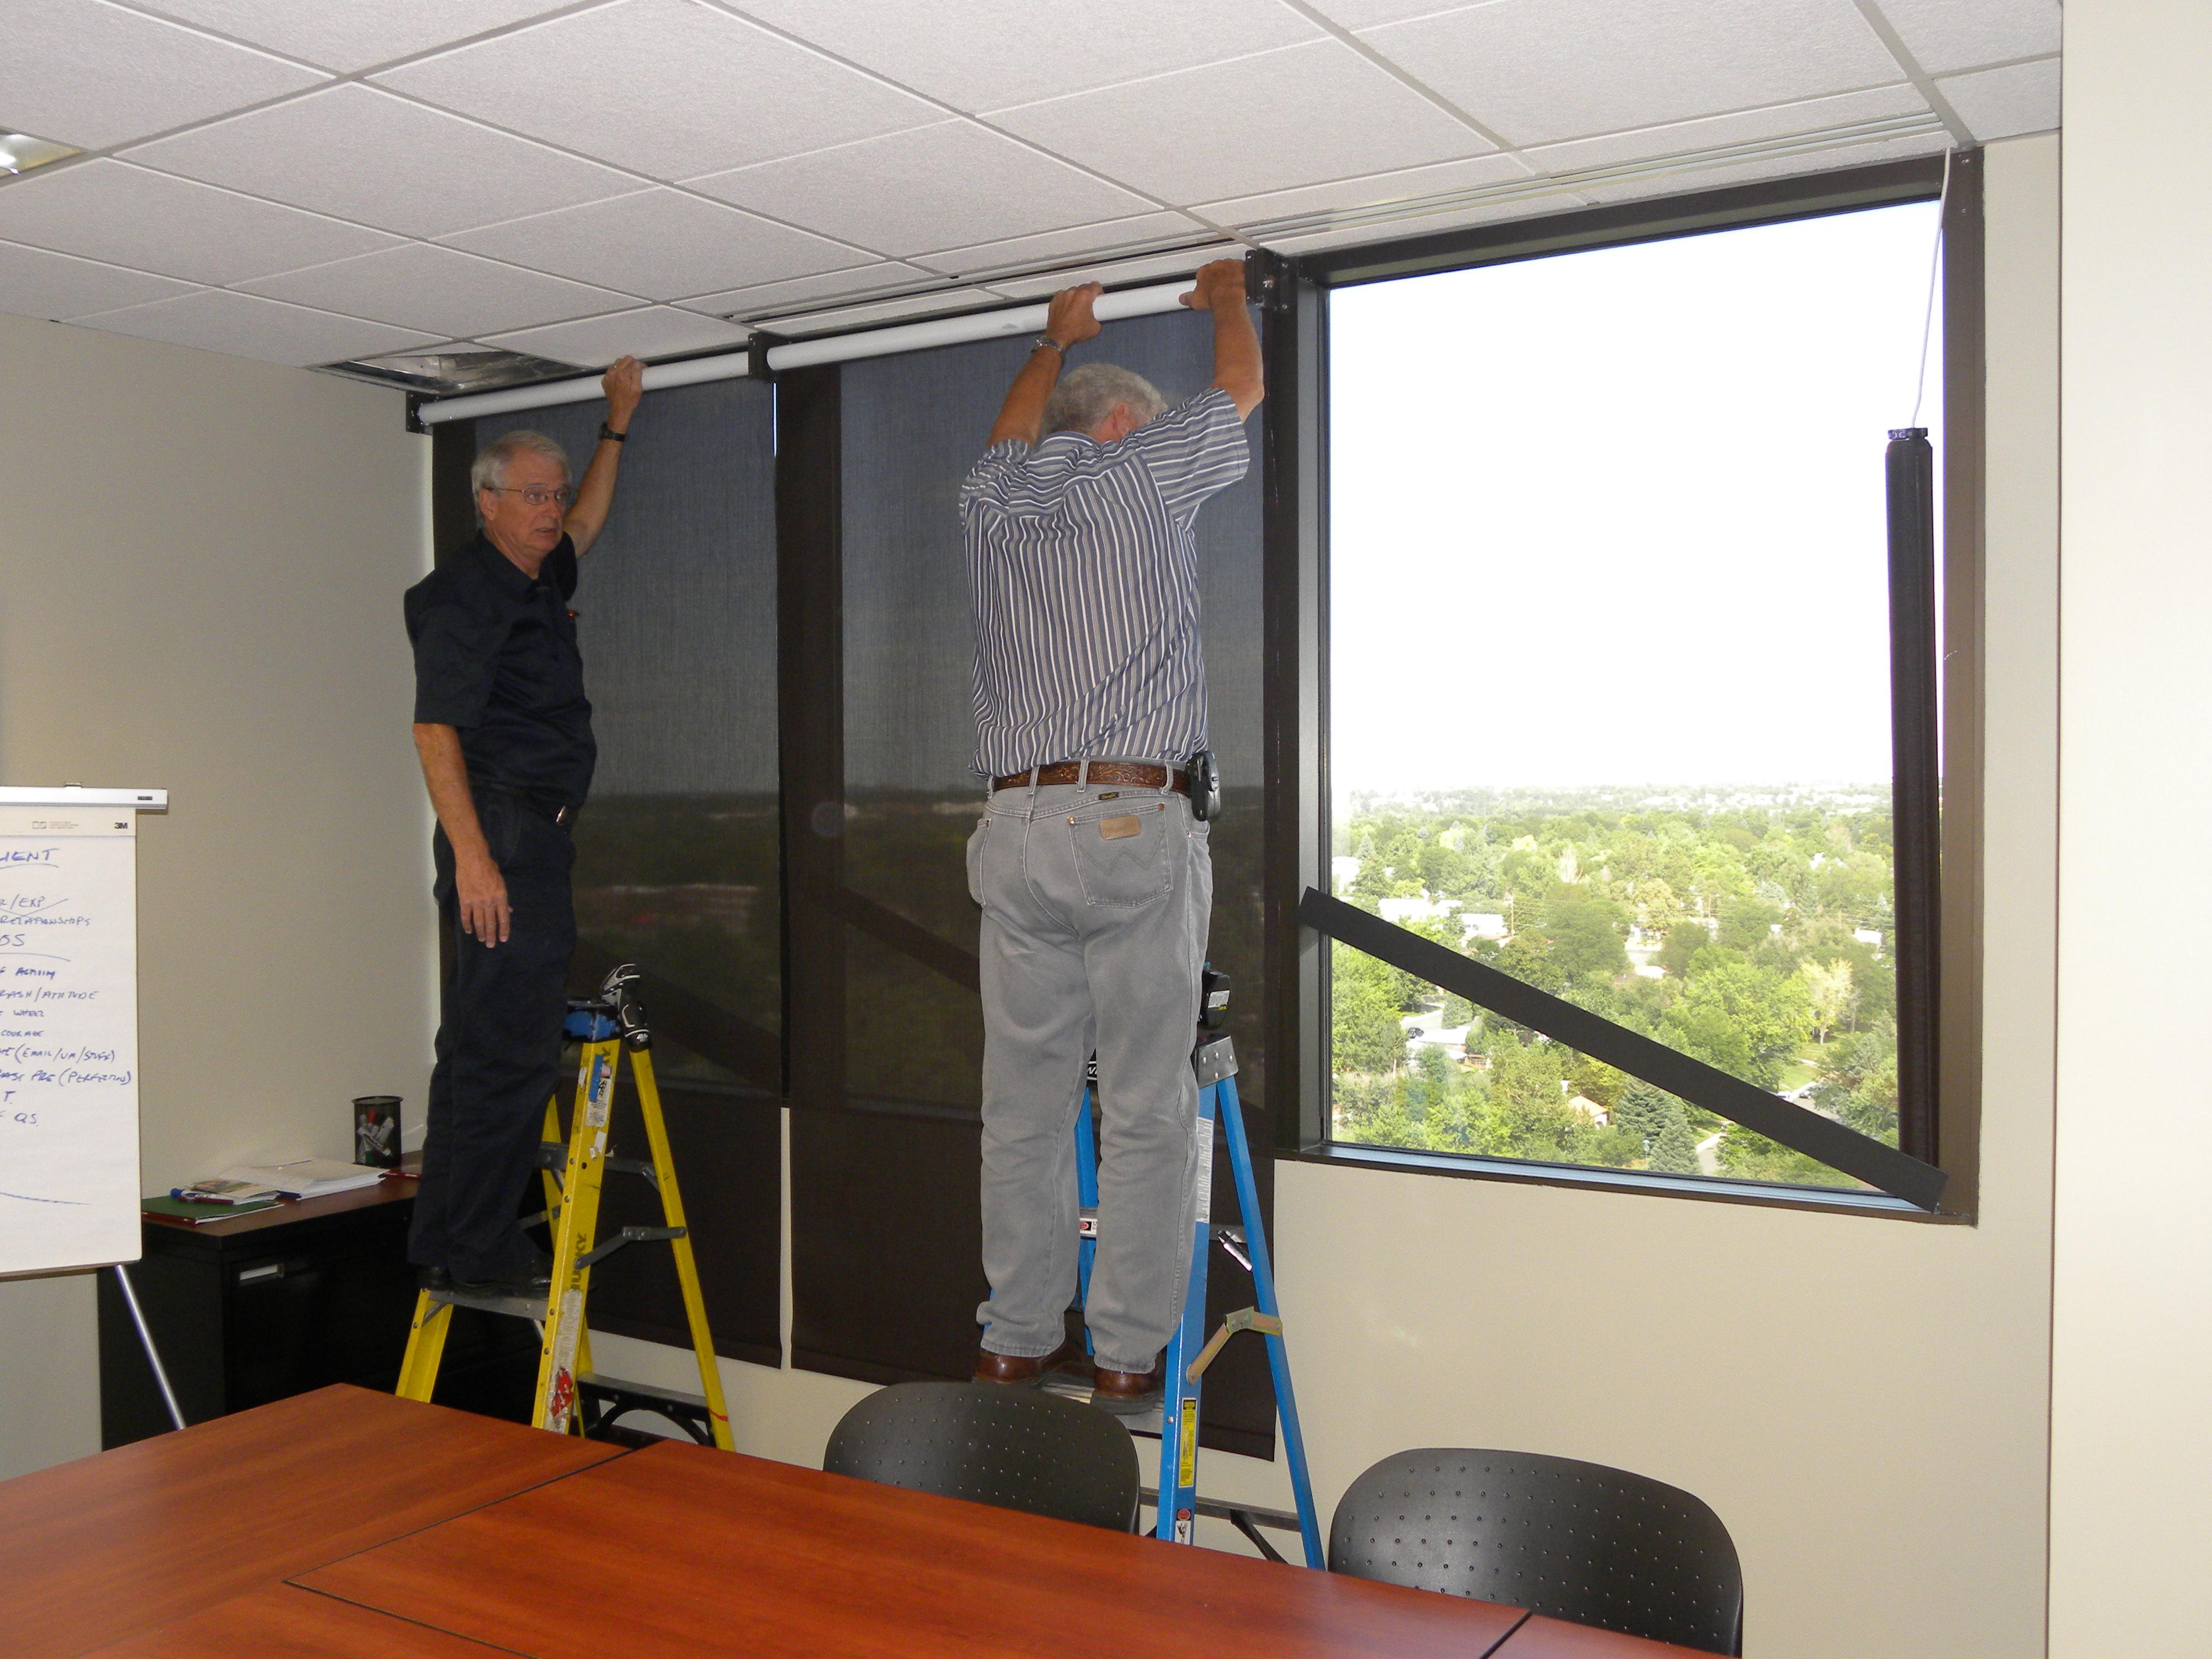 floor roller london sunscreen blinds to windows sliding pin installing window ceiling doors